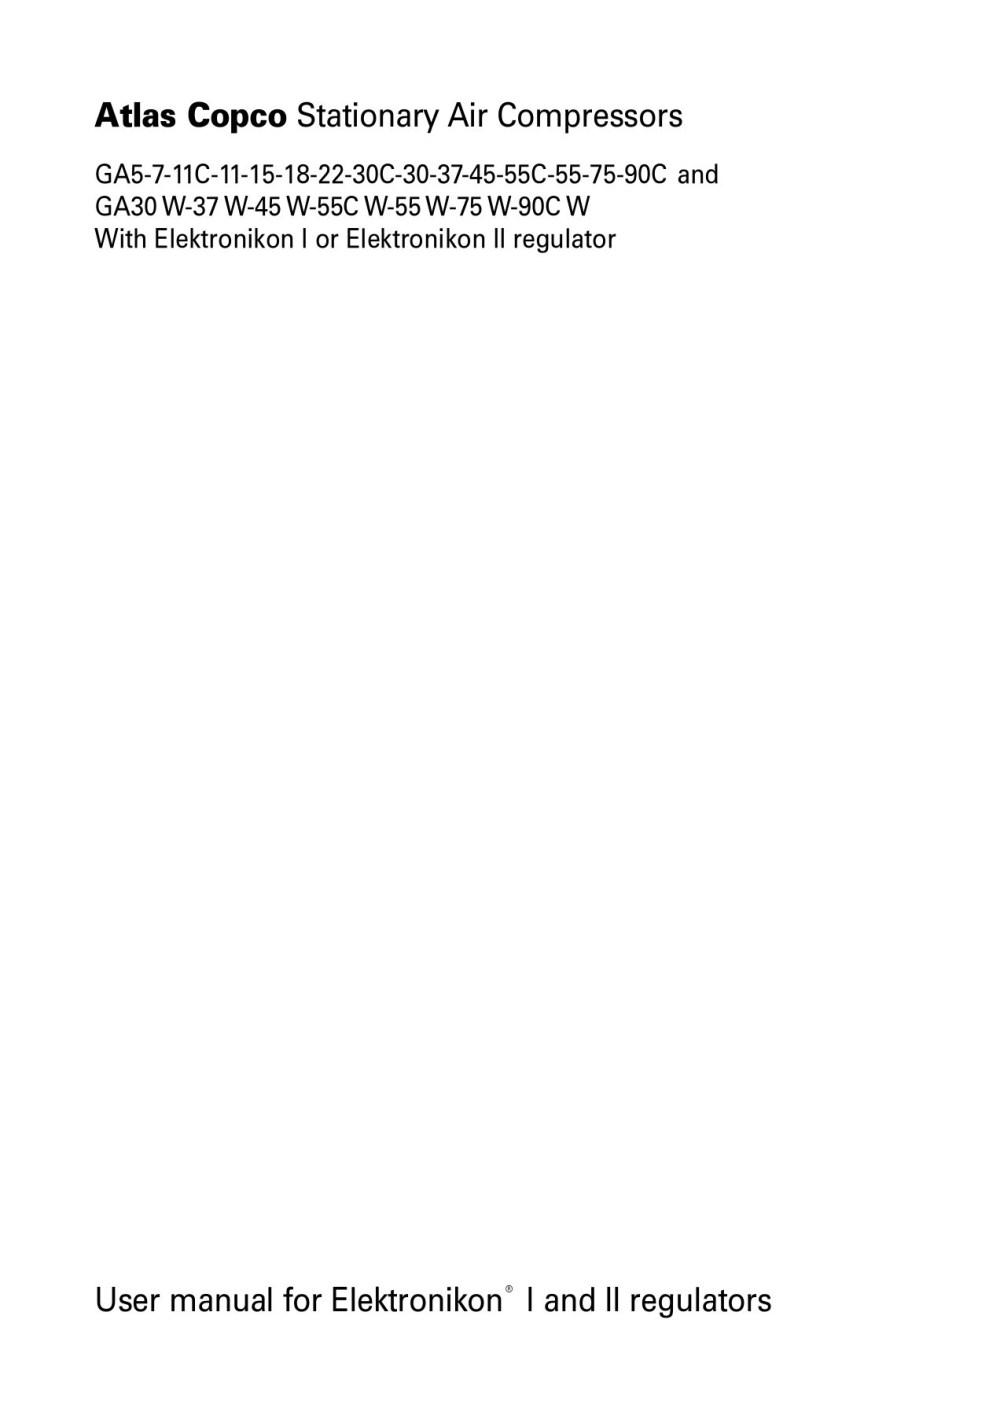 medium resolution of atlas copco ga 75 air compressor electrical diagram fliphtml5rh fliphtml5 com design